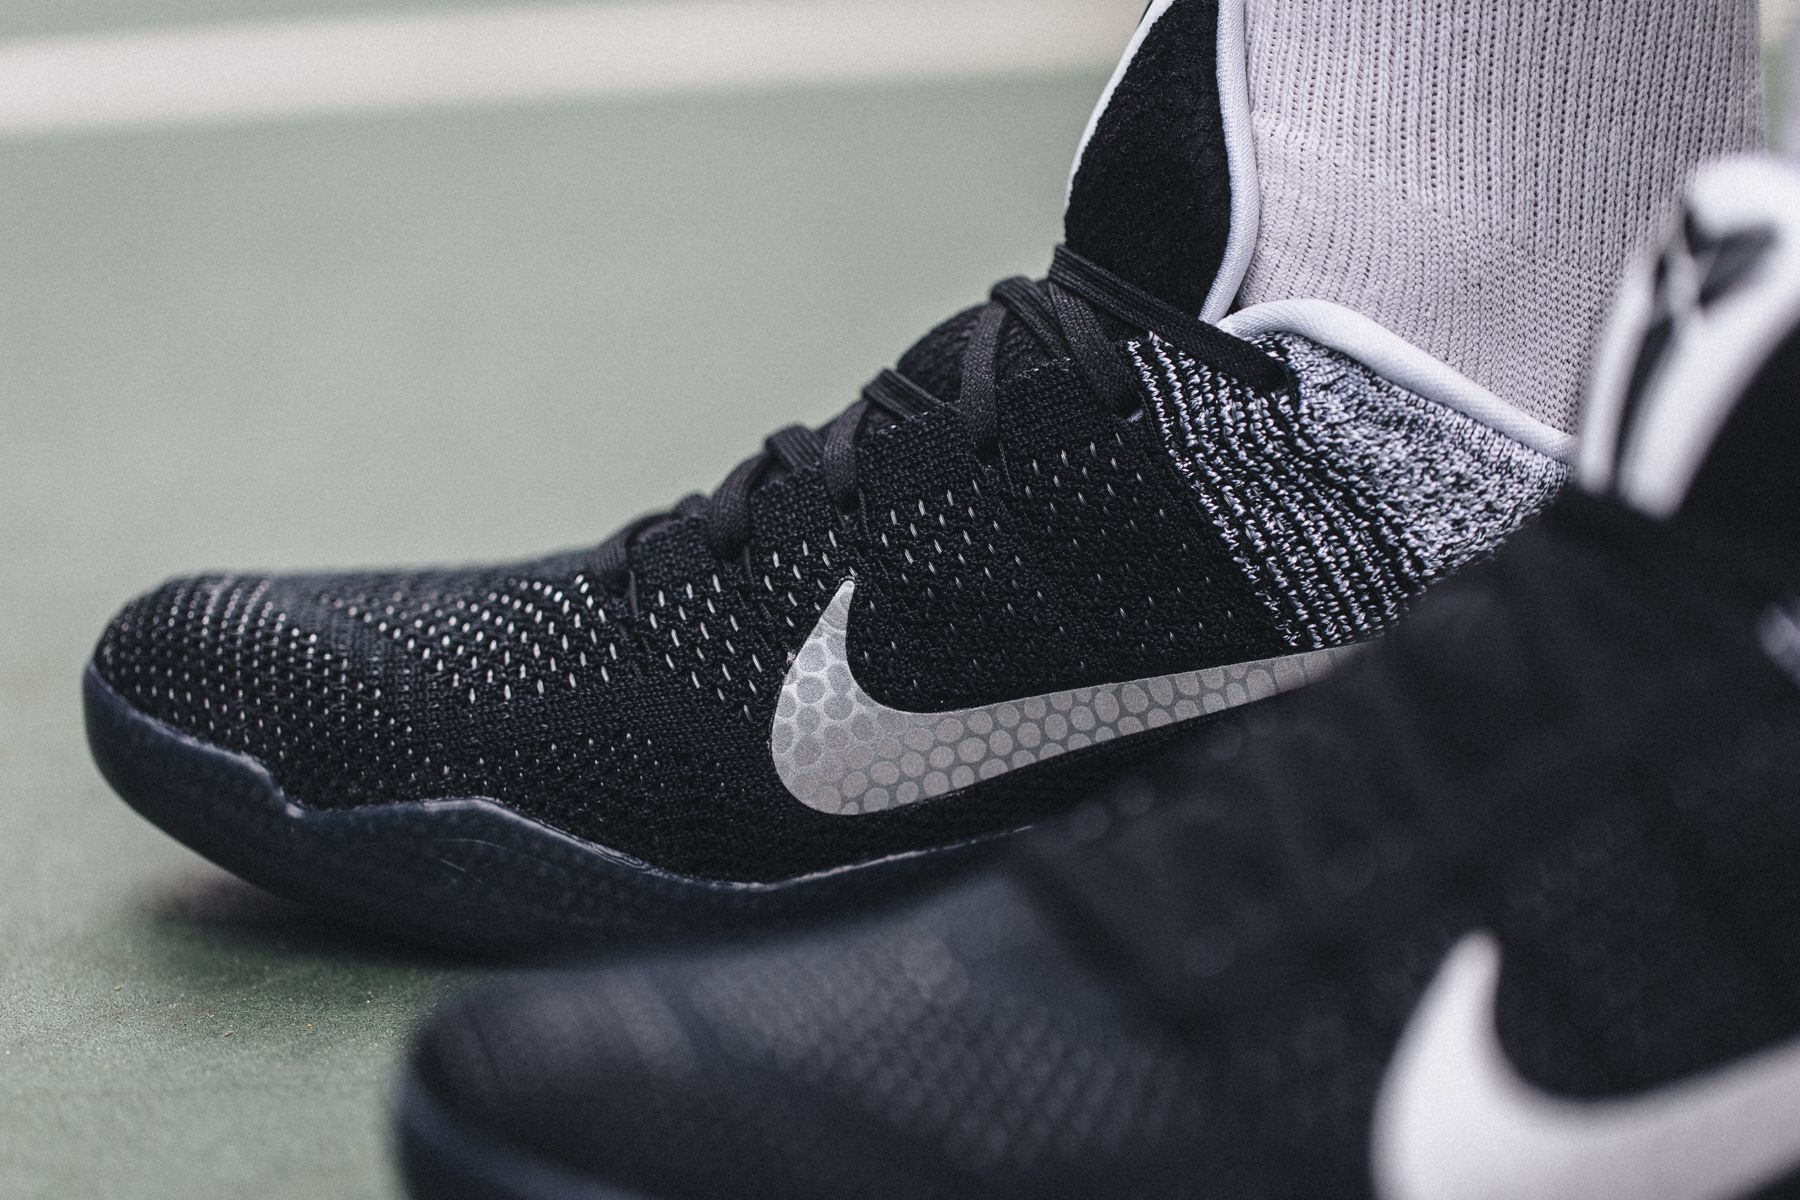 Kobe XI Elite Low Sneaker Review